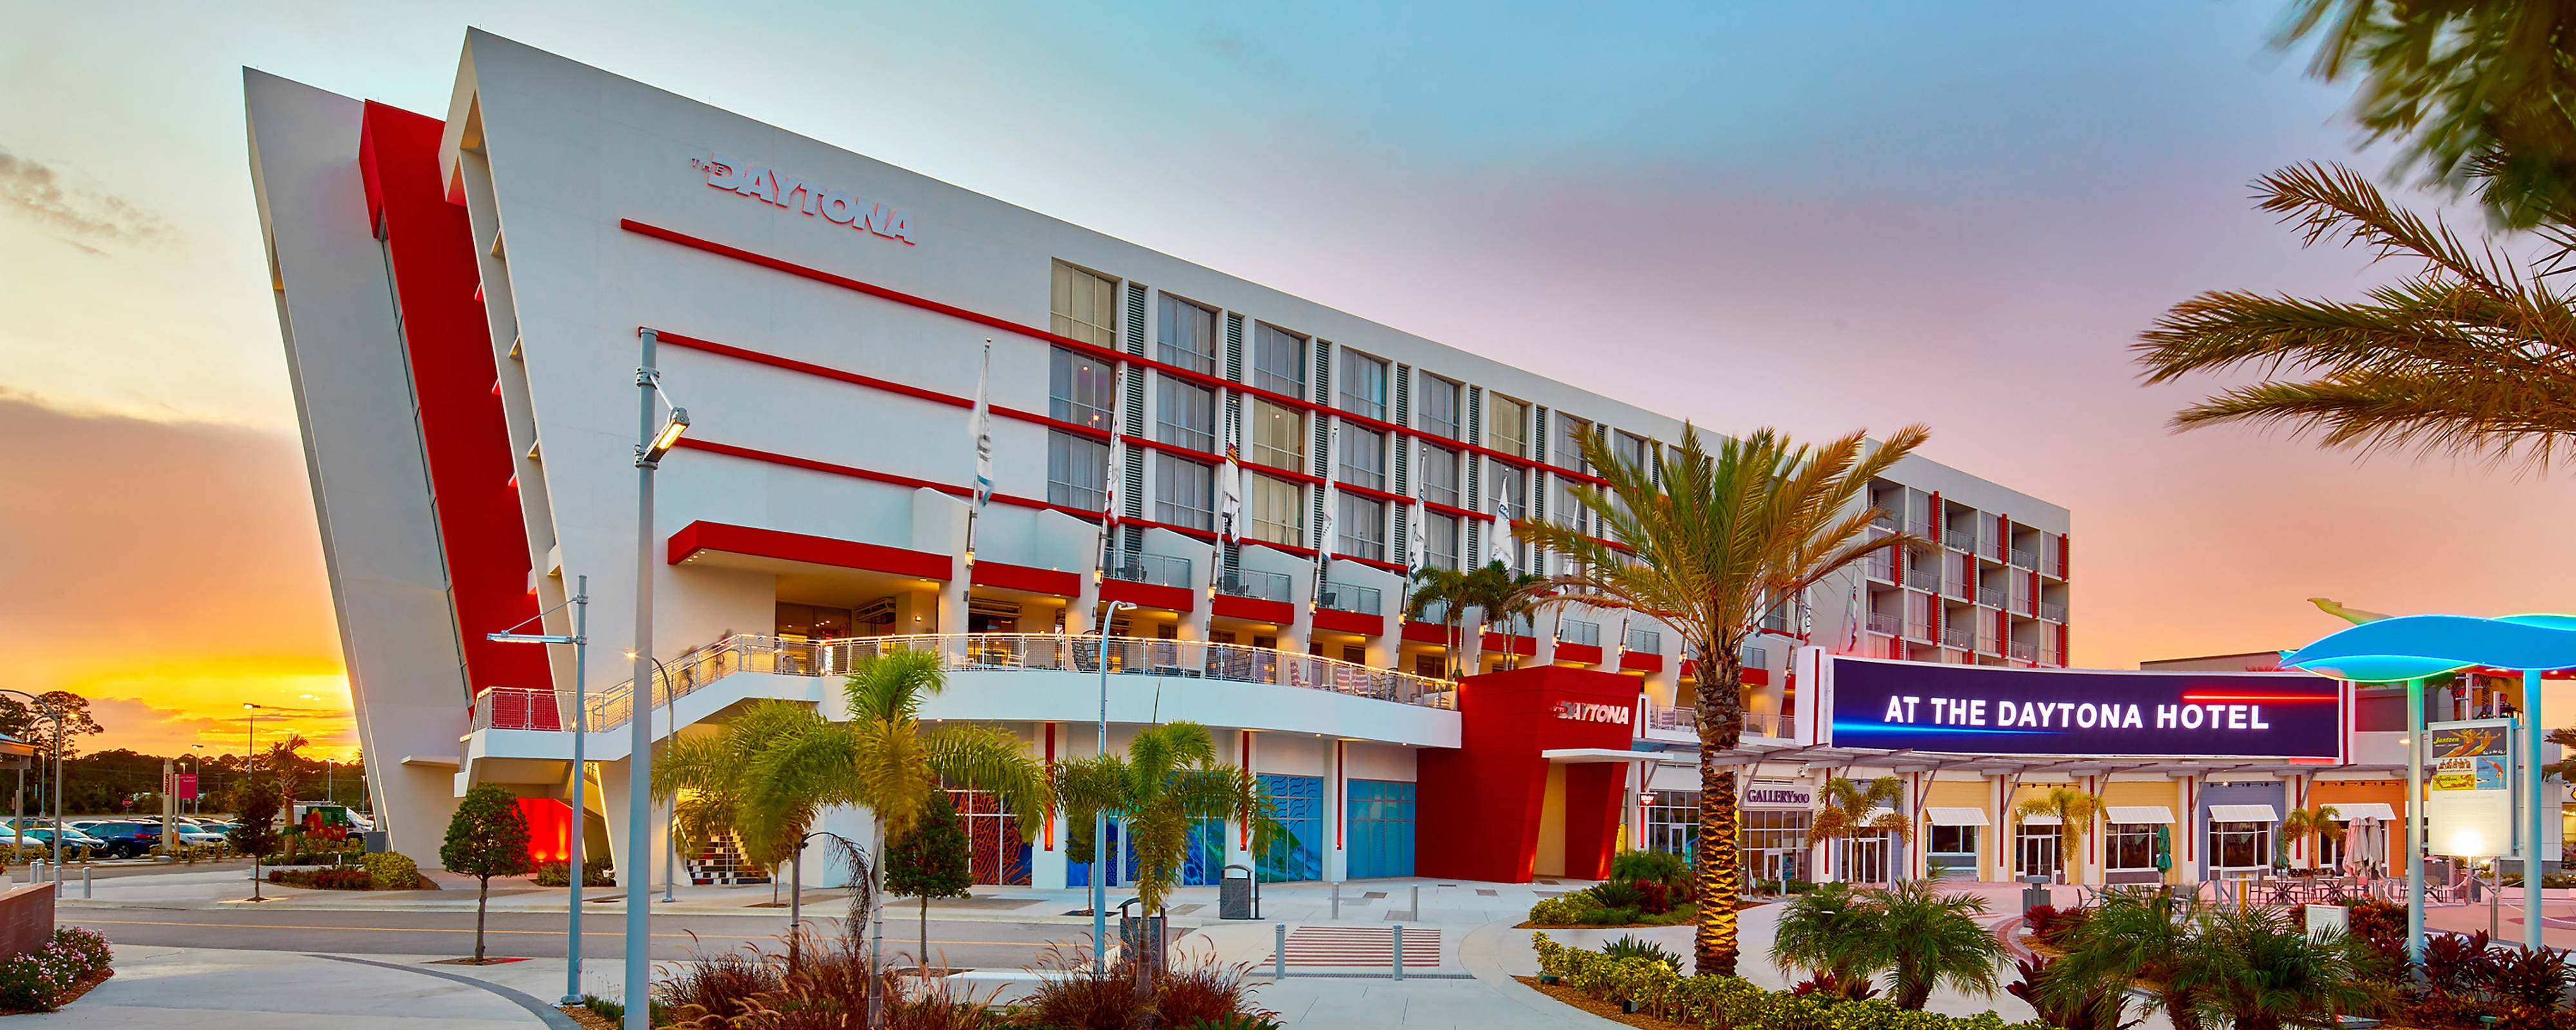 Boutique Hotel In Daytona Beach The